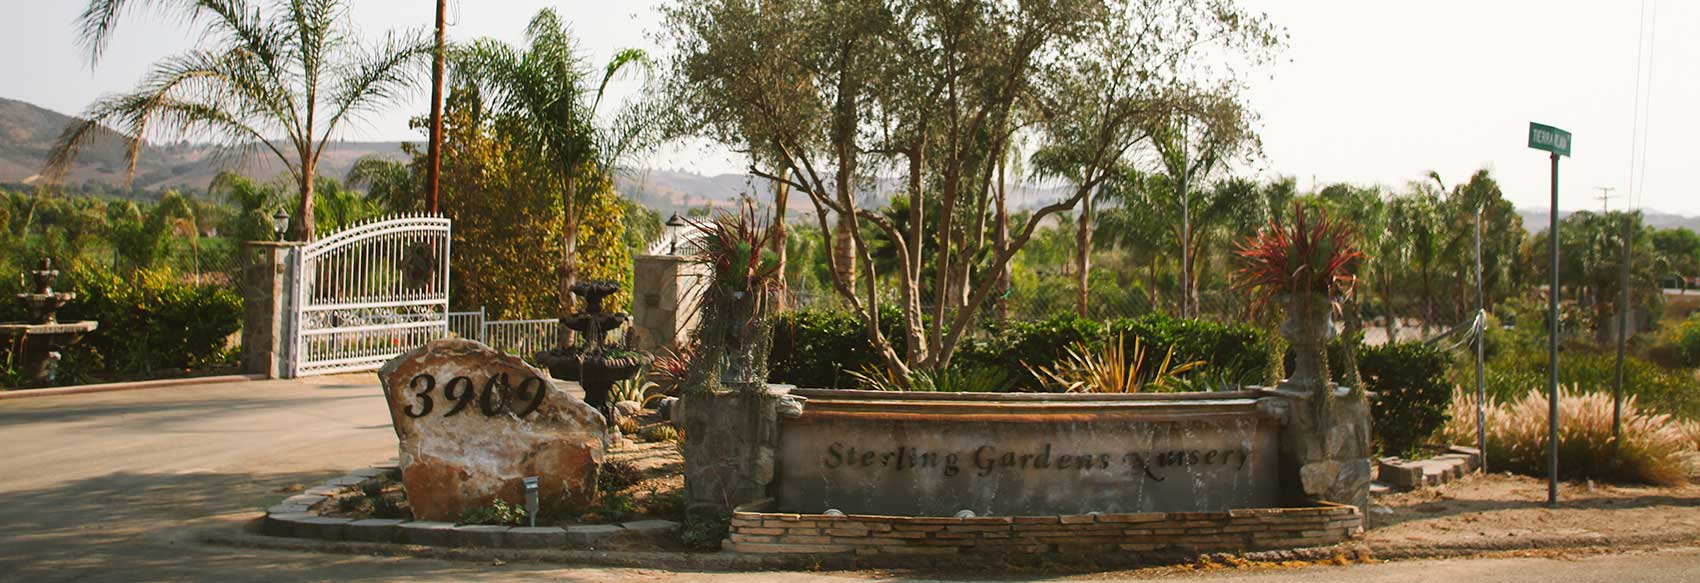 Sterling Garden's Street View